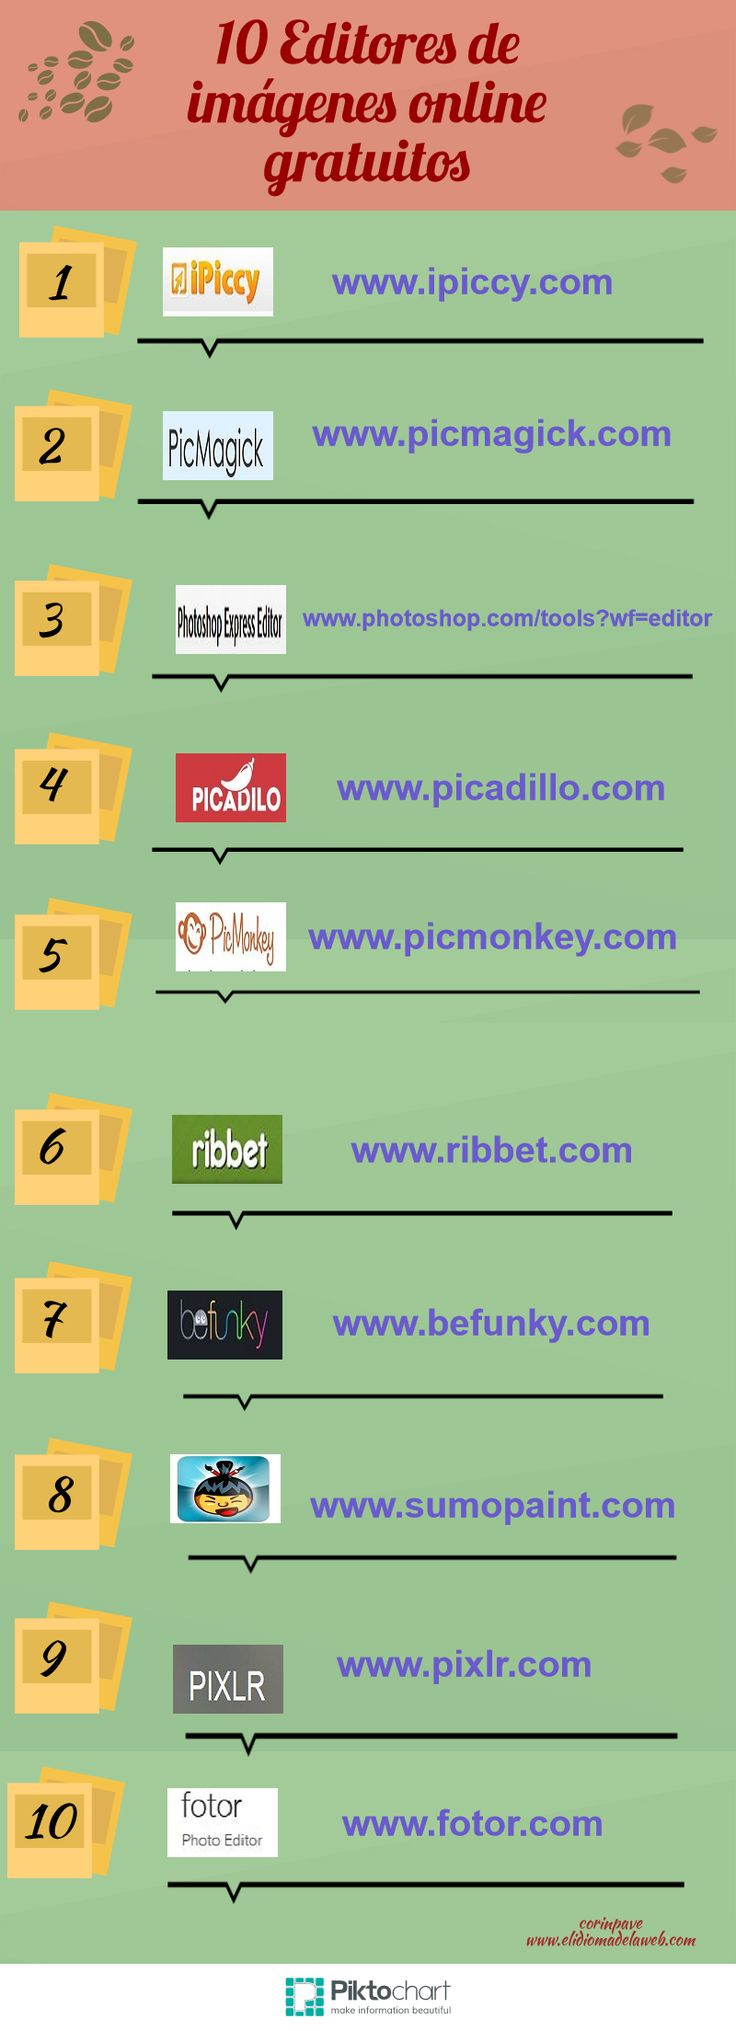 RT @alfredovela: '10 editores de imágenes online gratuitos #infografia #infographic '